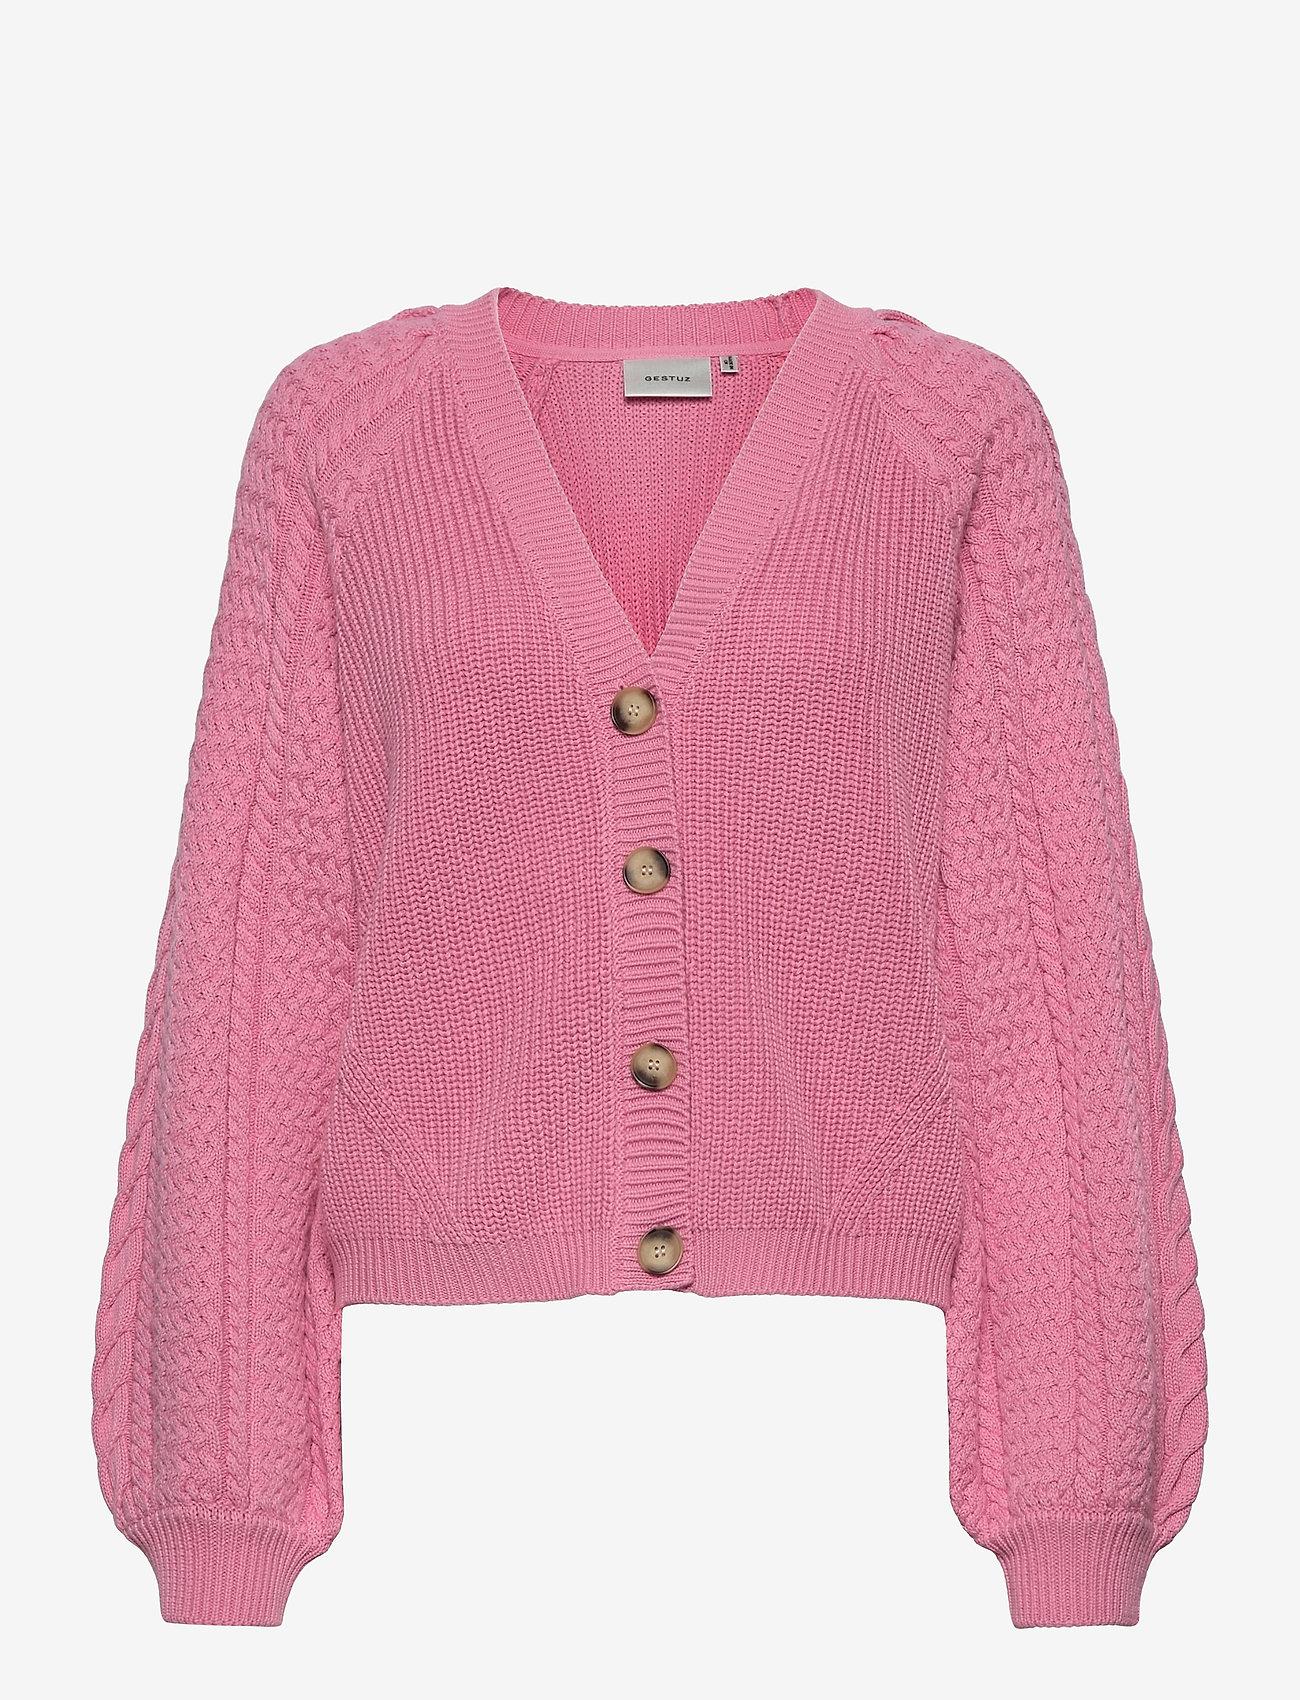 Gestuz - ViolaGZ cardigan - cardigans - cashmere rose - 1